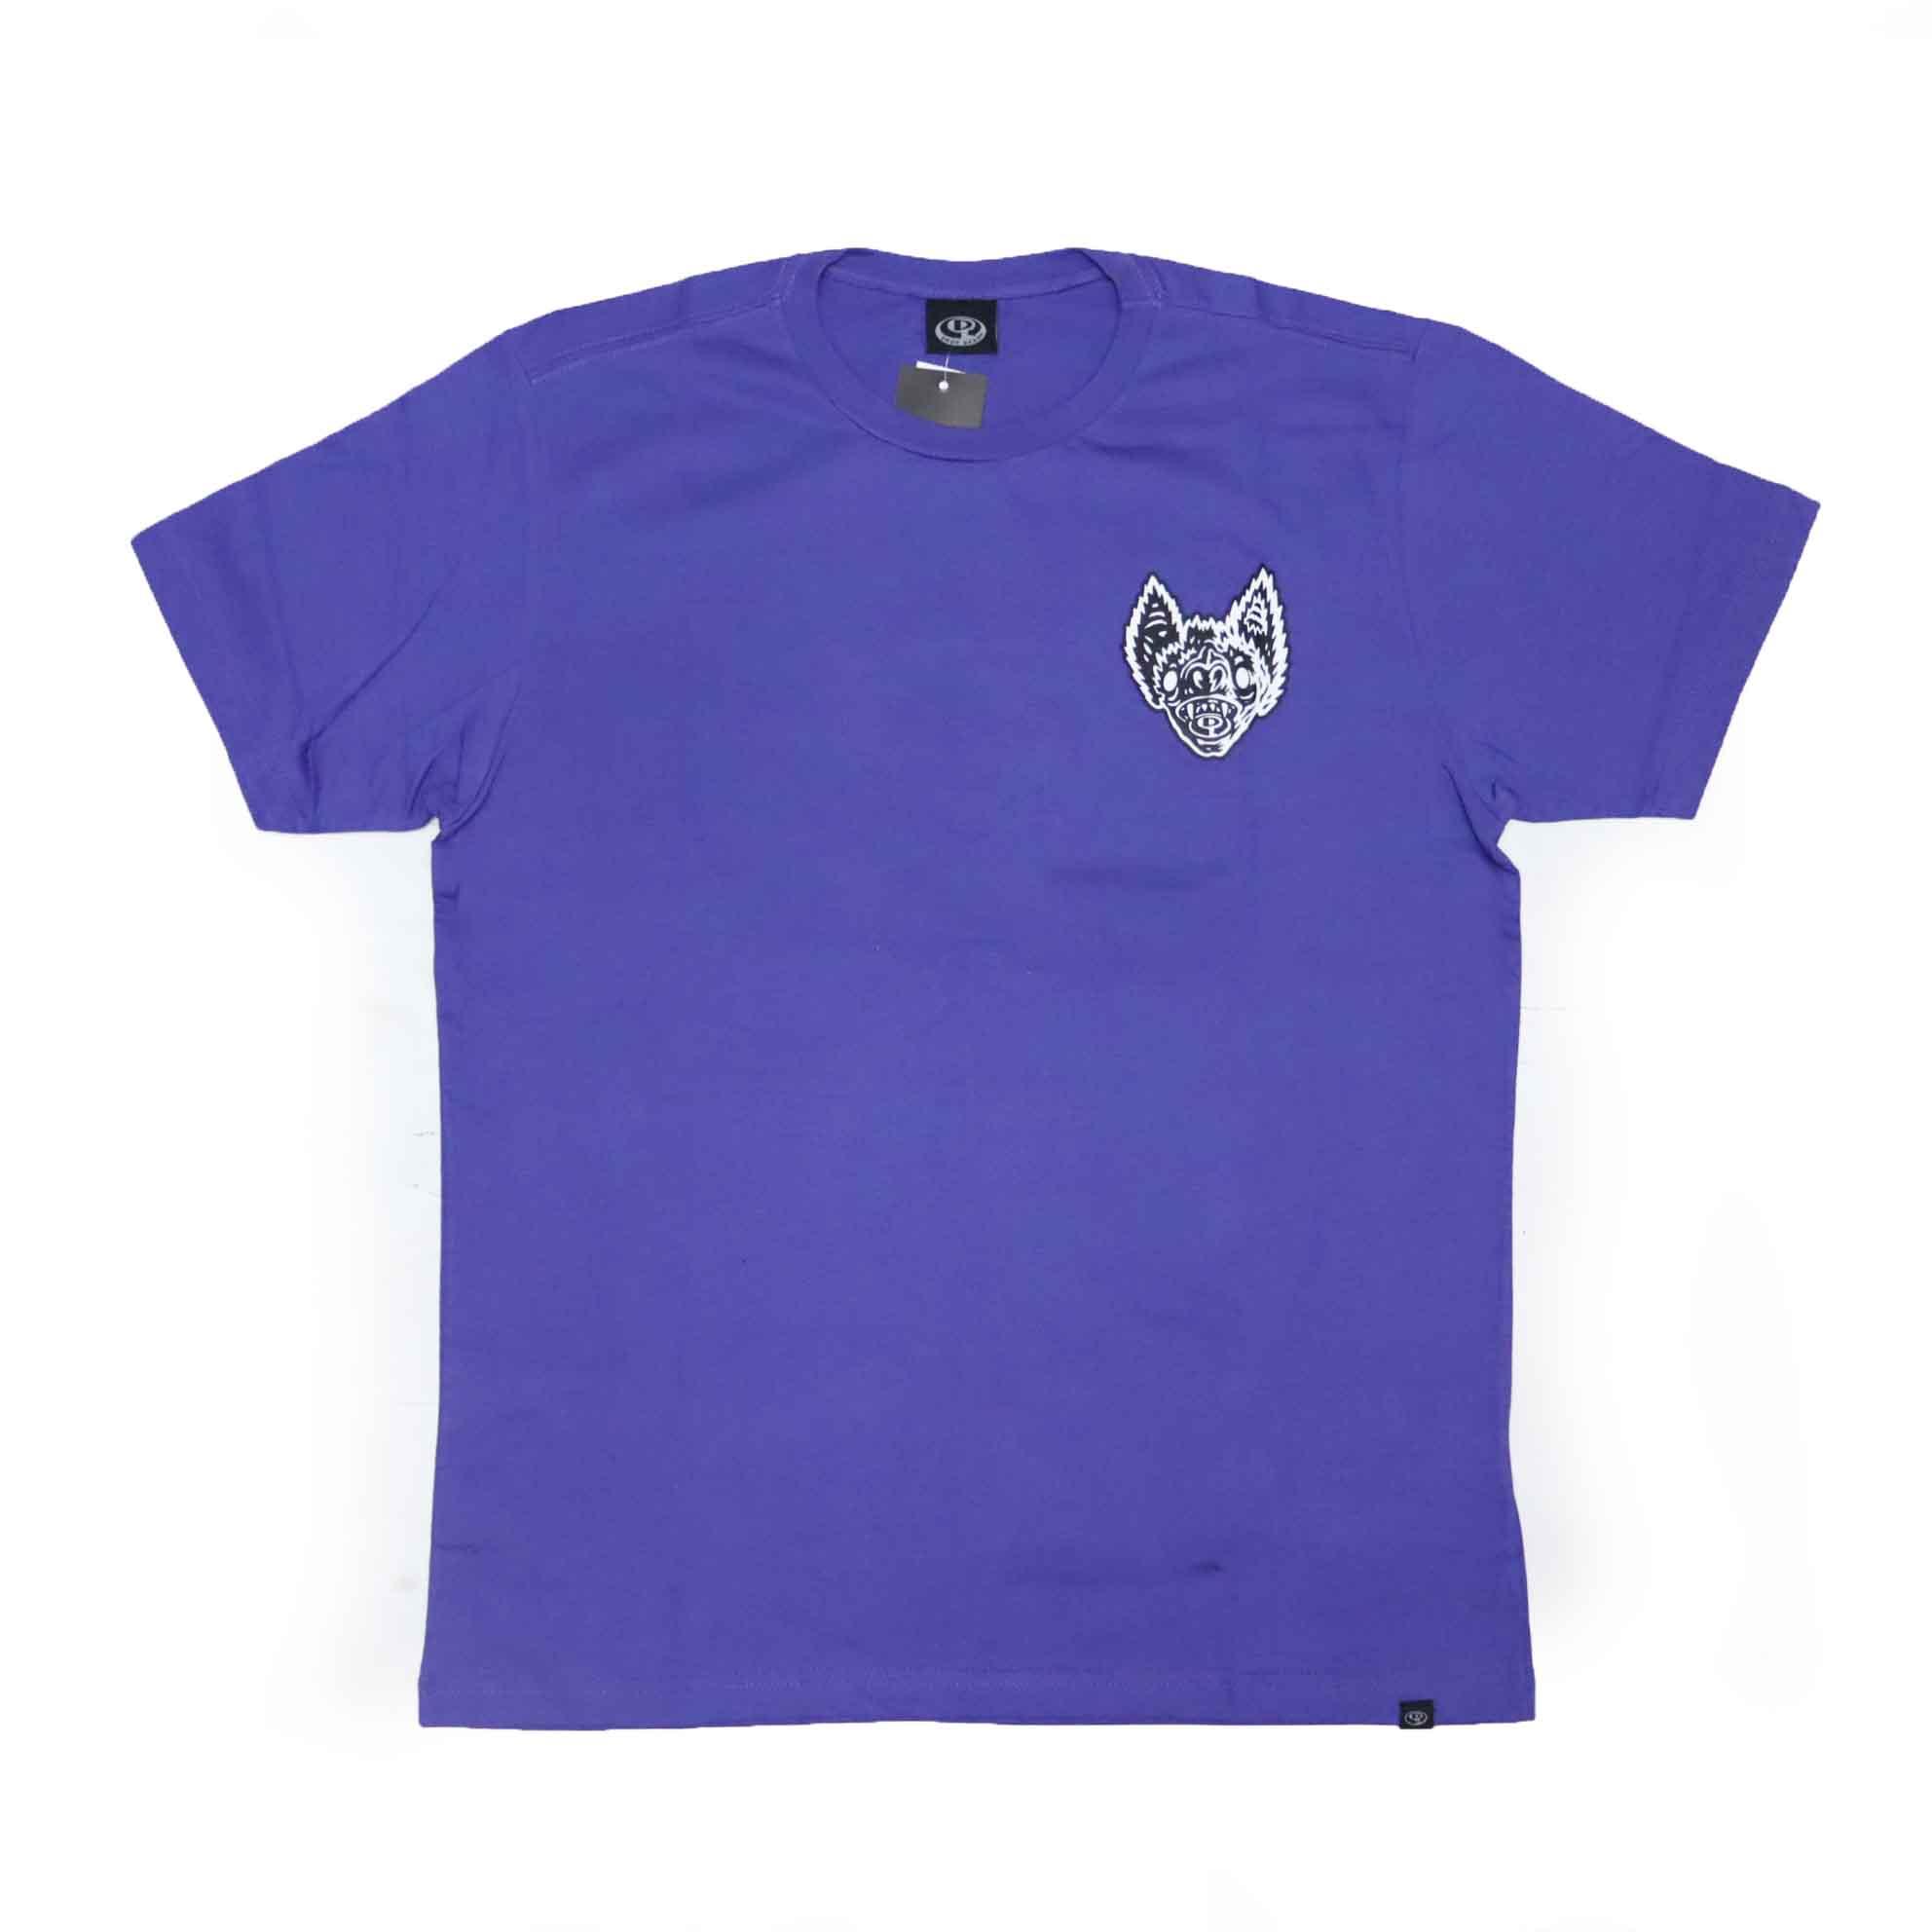 Camiseta Drop Dead Bat Head - Roxo